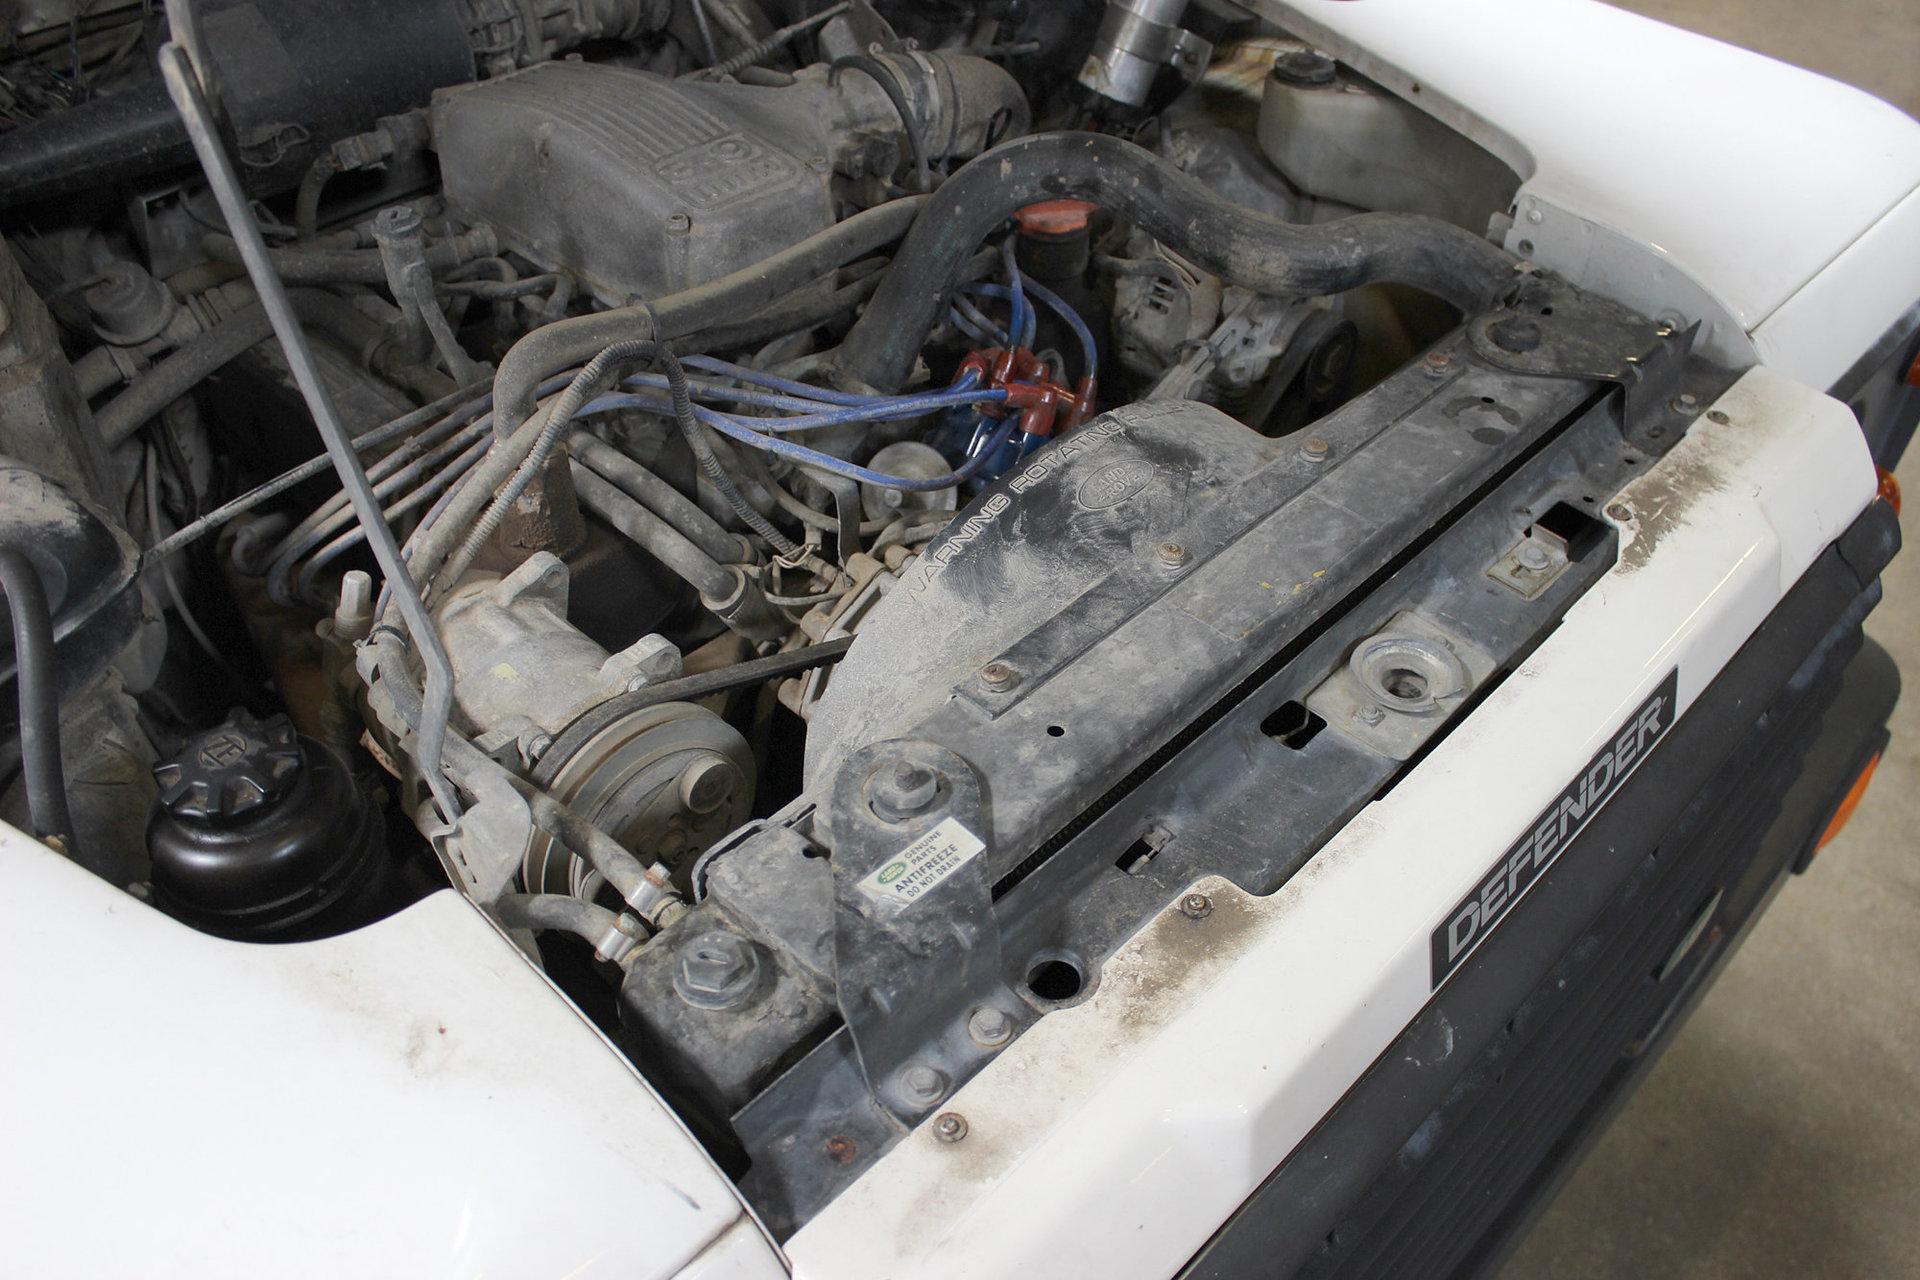 1993 Land Rover Defender 110 San Francisco Sports Cars Antifreeze